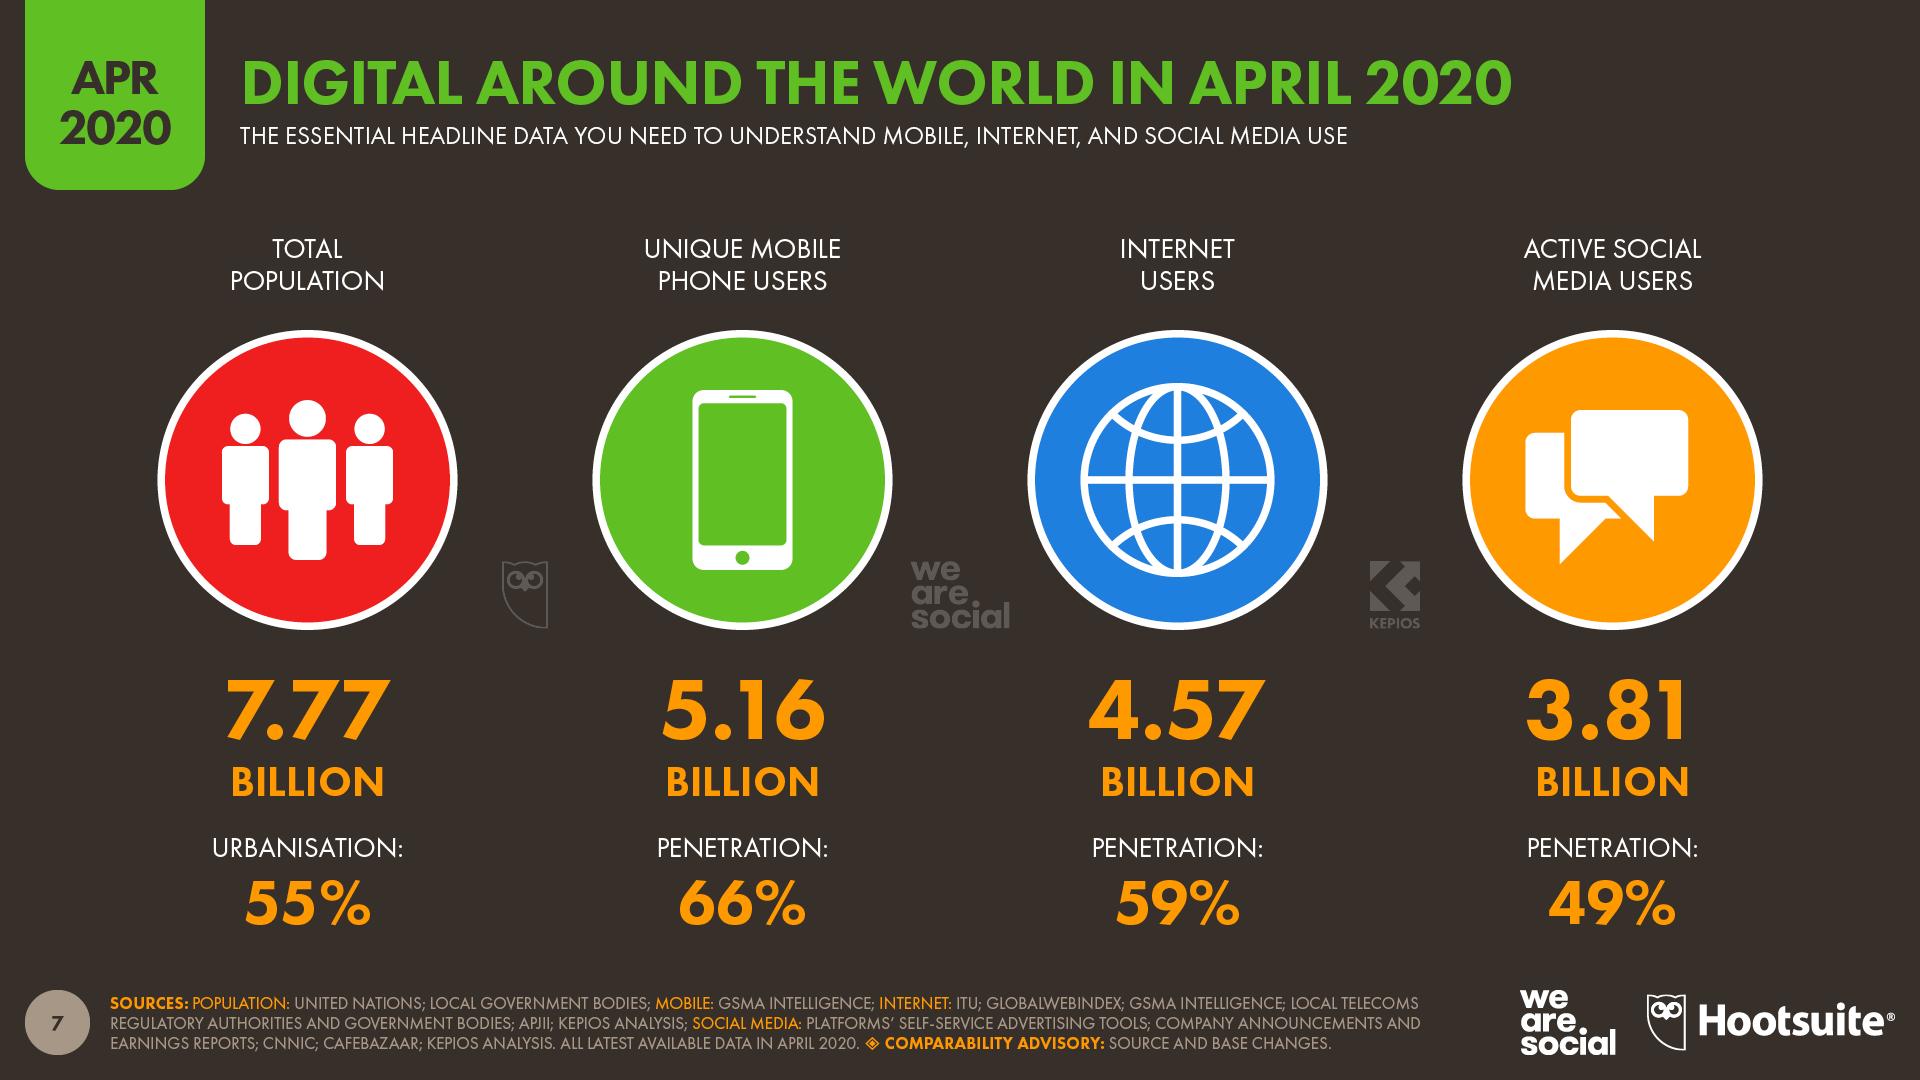 avril 2020 utilisation internet dans le monde